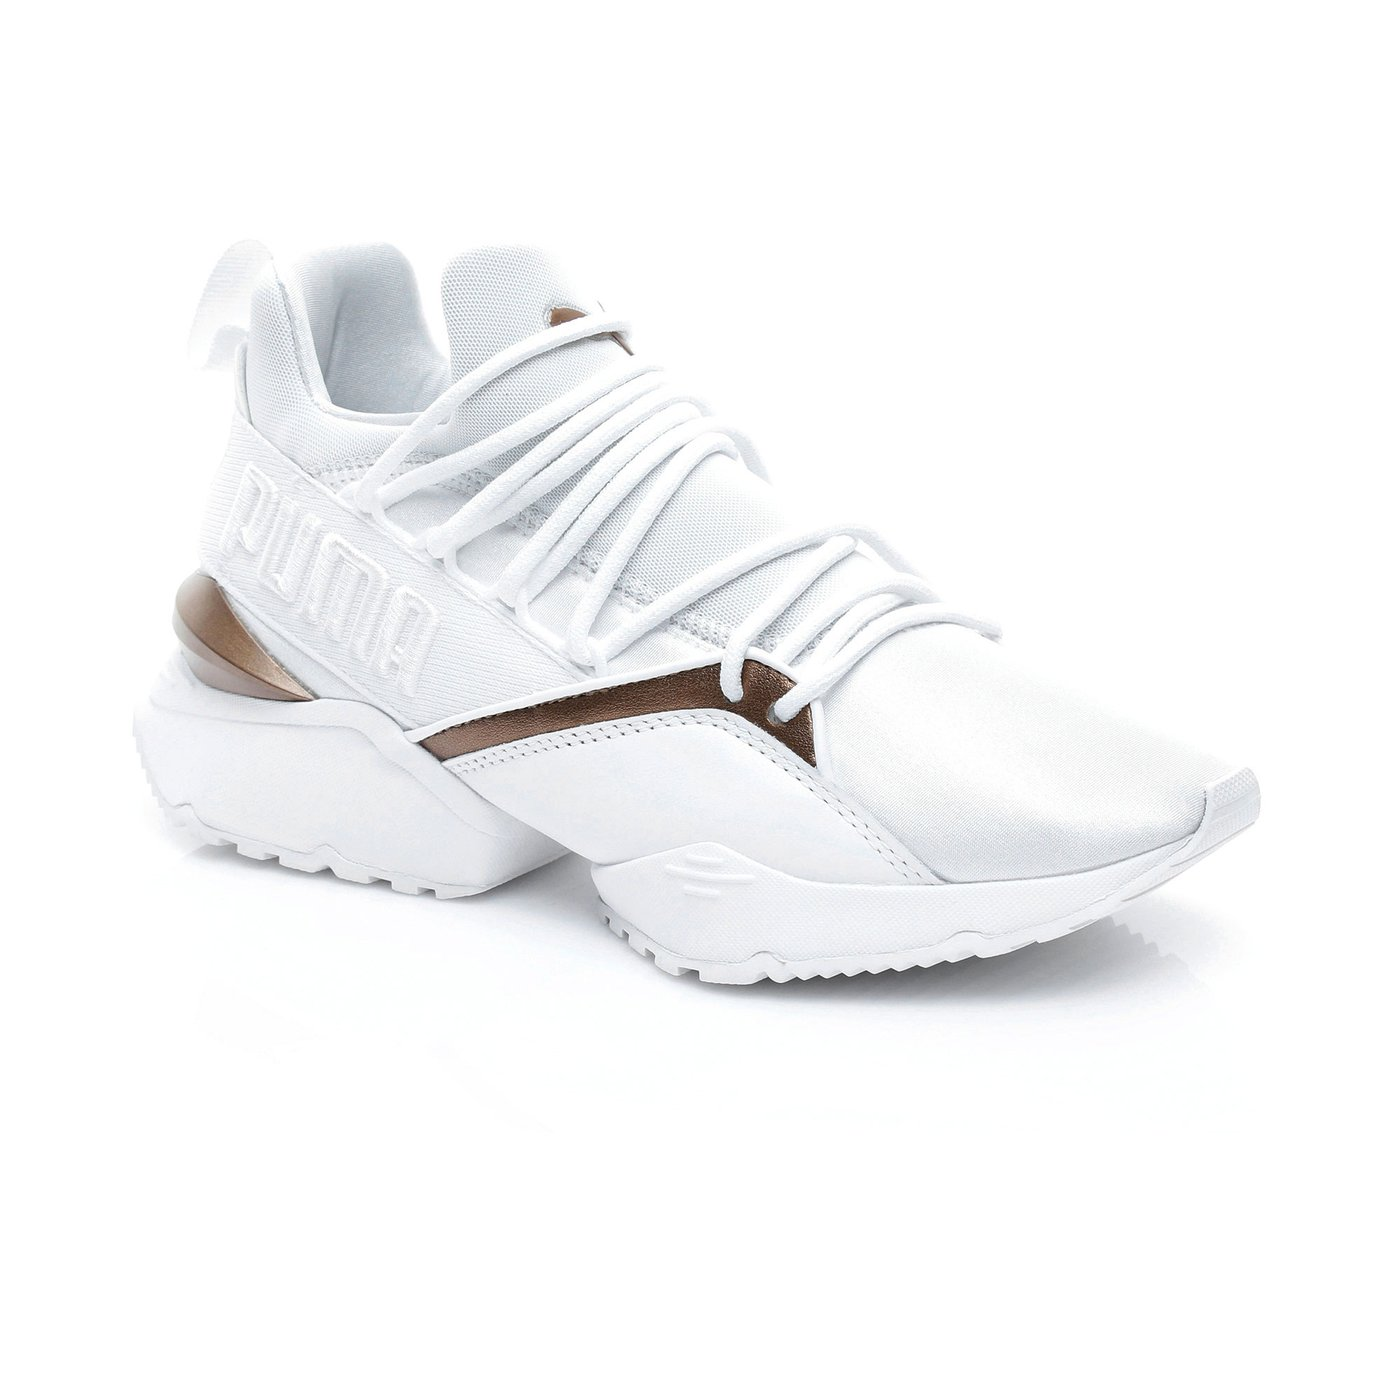 Puma Muse Maia Luxe Wn S Kadın Beyaz Sneaker